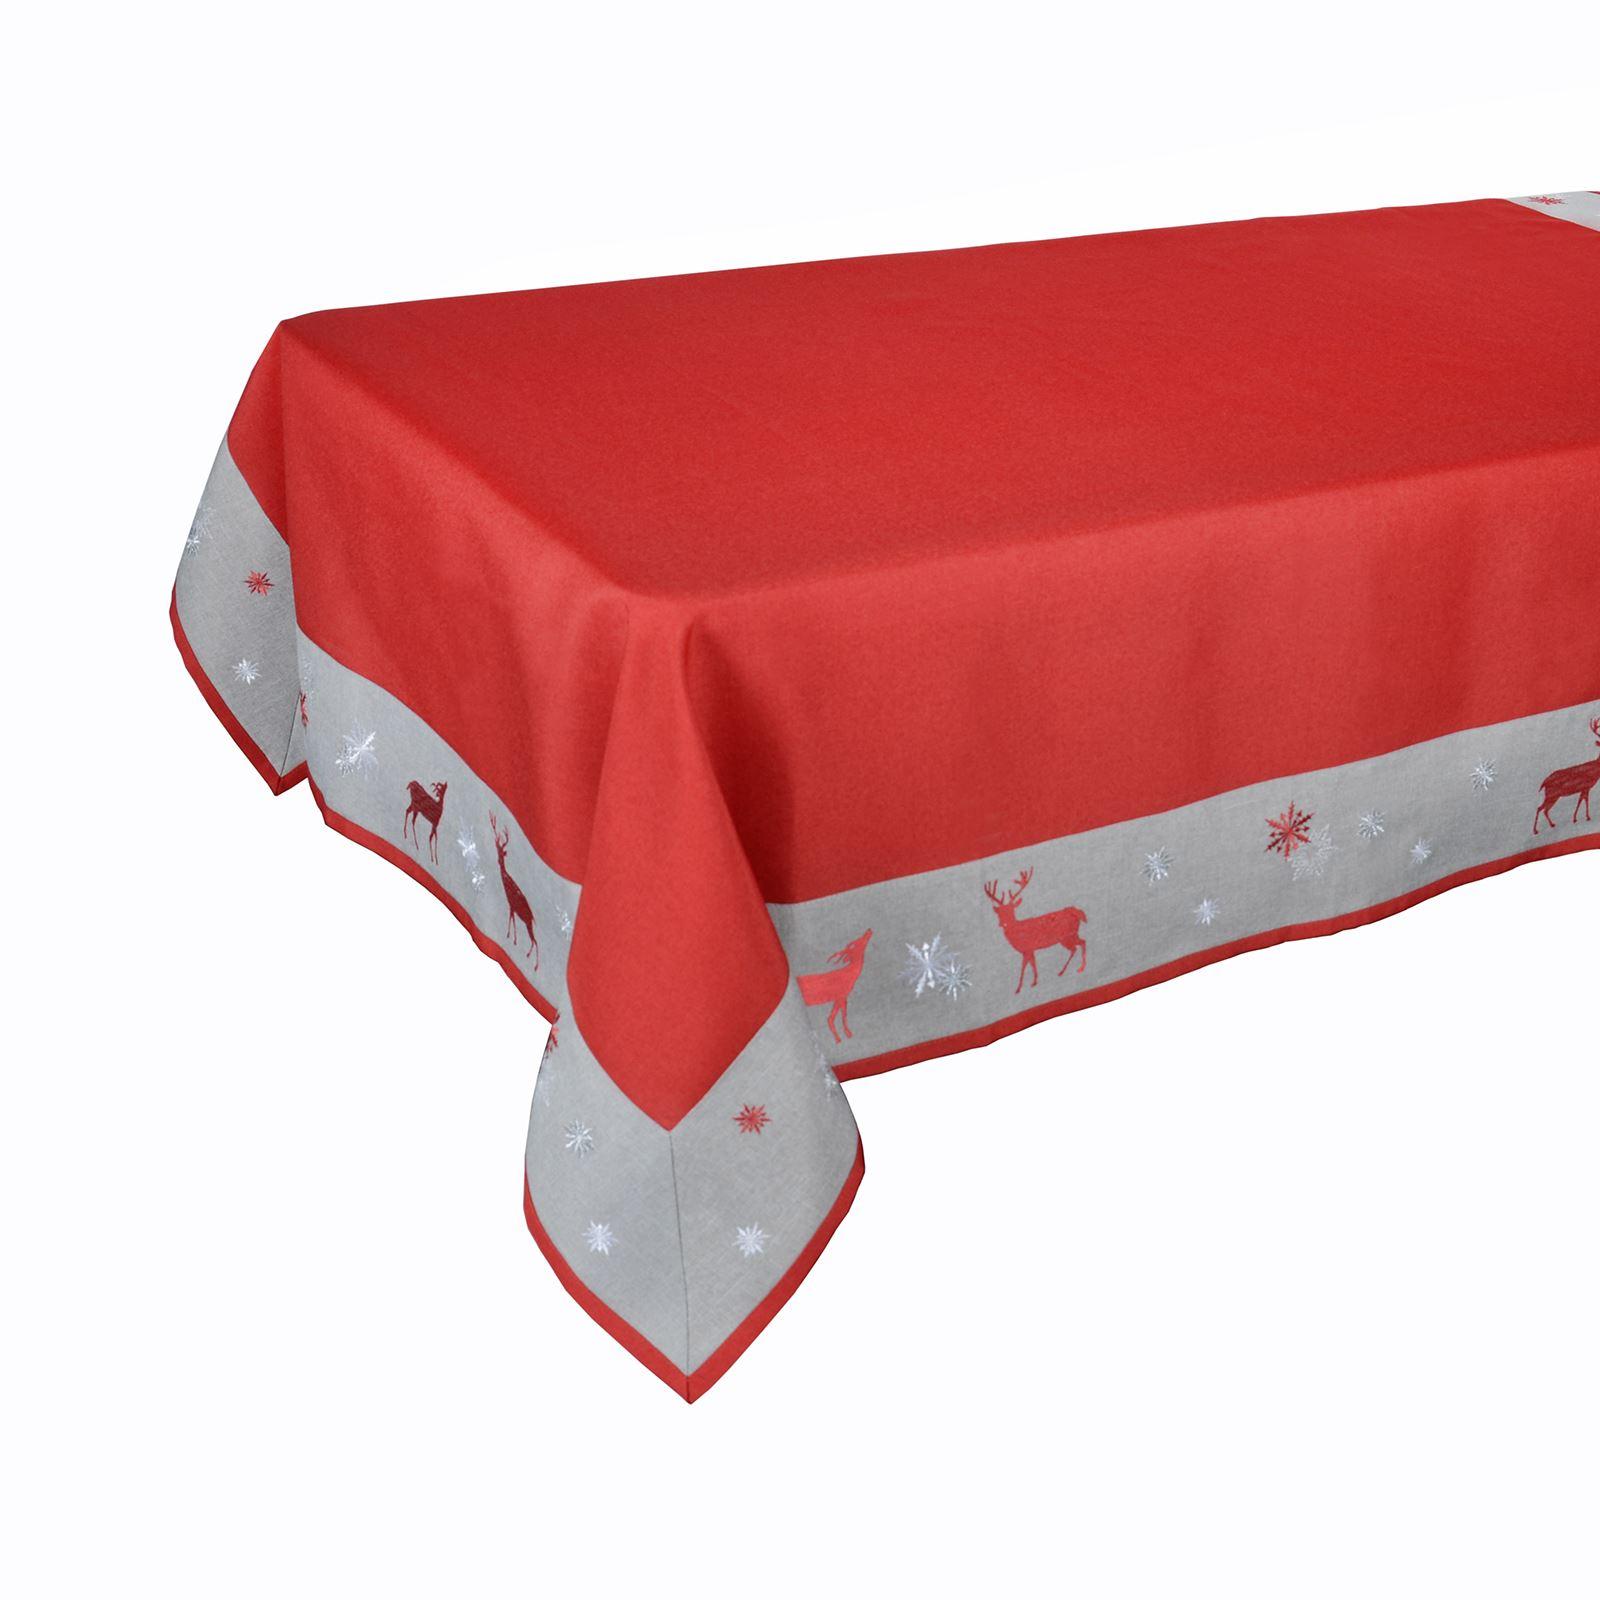 Christmas-Tablecloth-Festive-Pattern-Rectangle-Round-Fabric-Xmas-Room-Decoration Indexbild 62